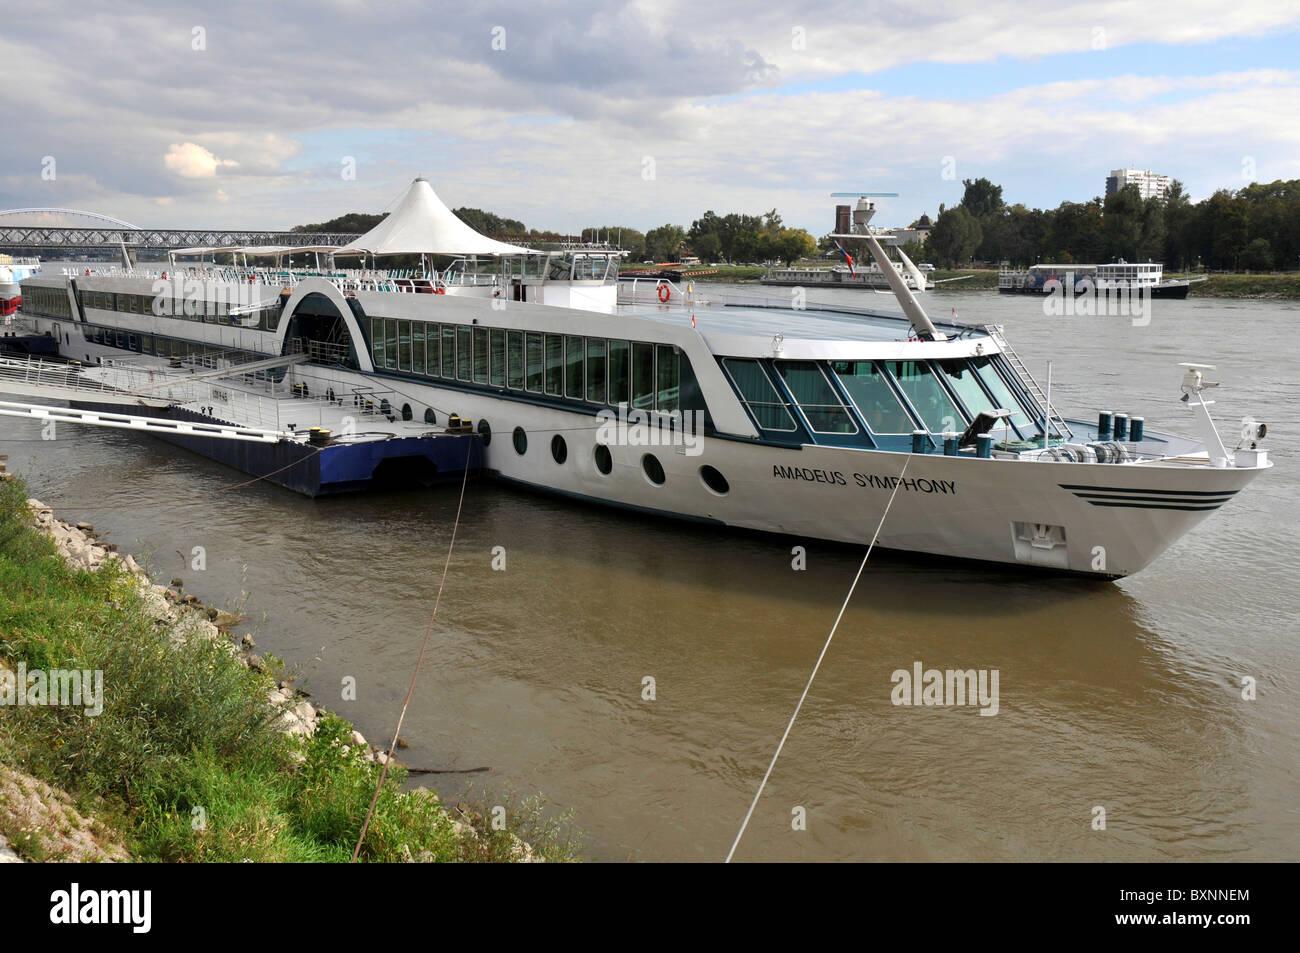 Amadeus Symphony passenger ship on the River Danube, Bratislava, Slovakia, Europe - Stock Image